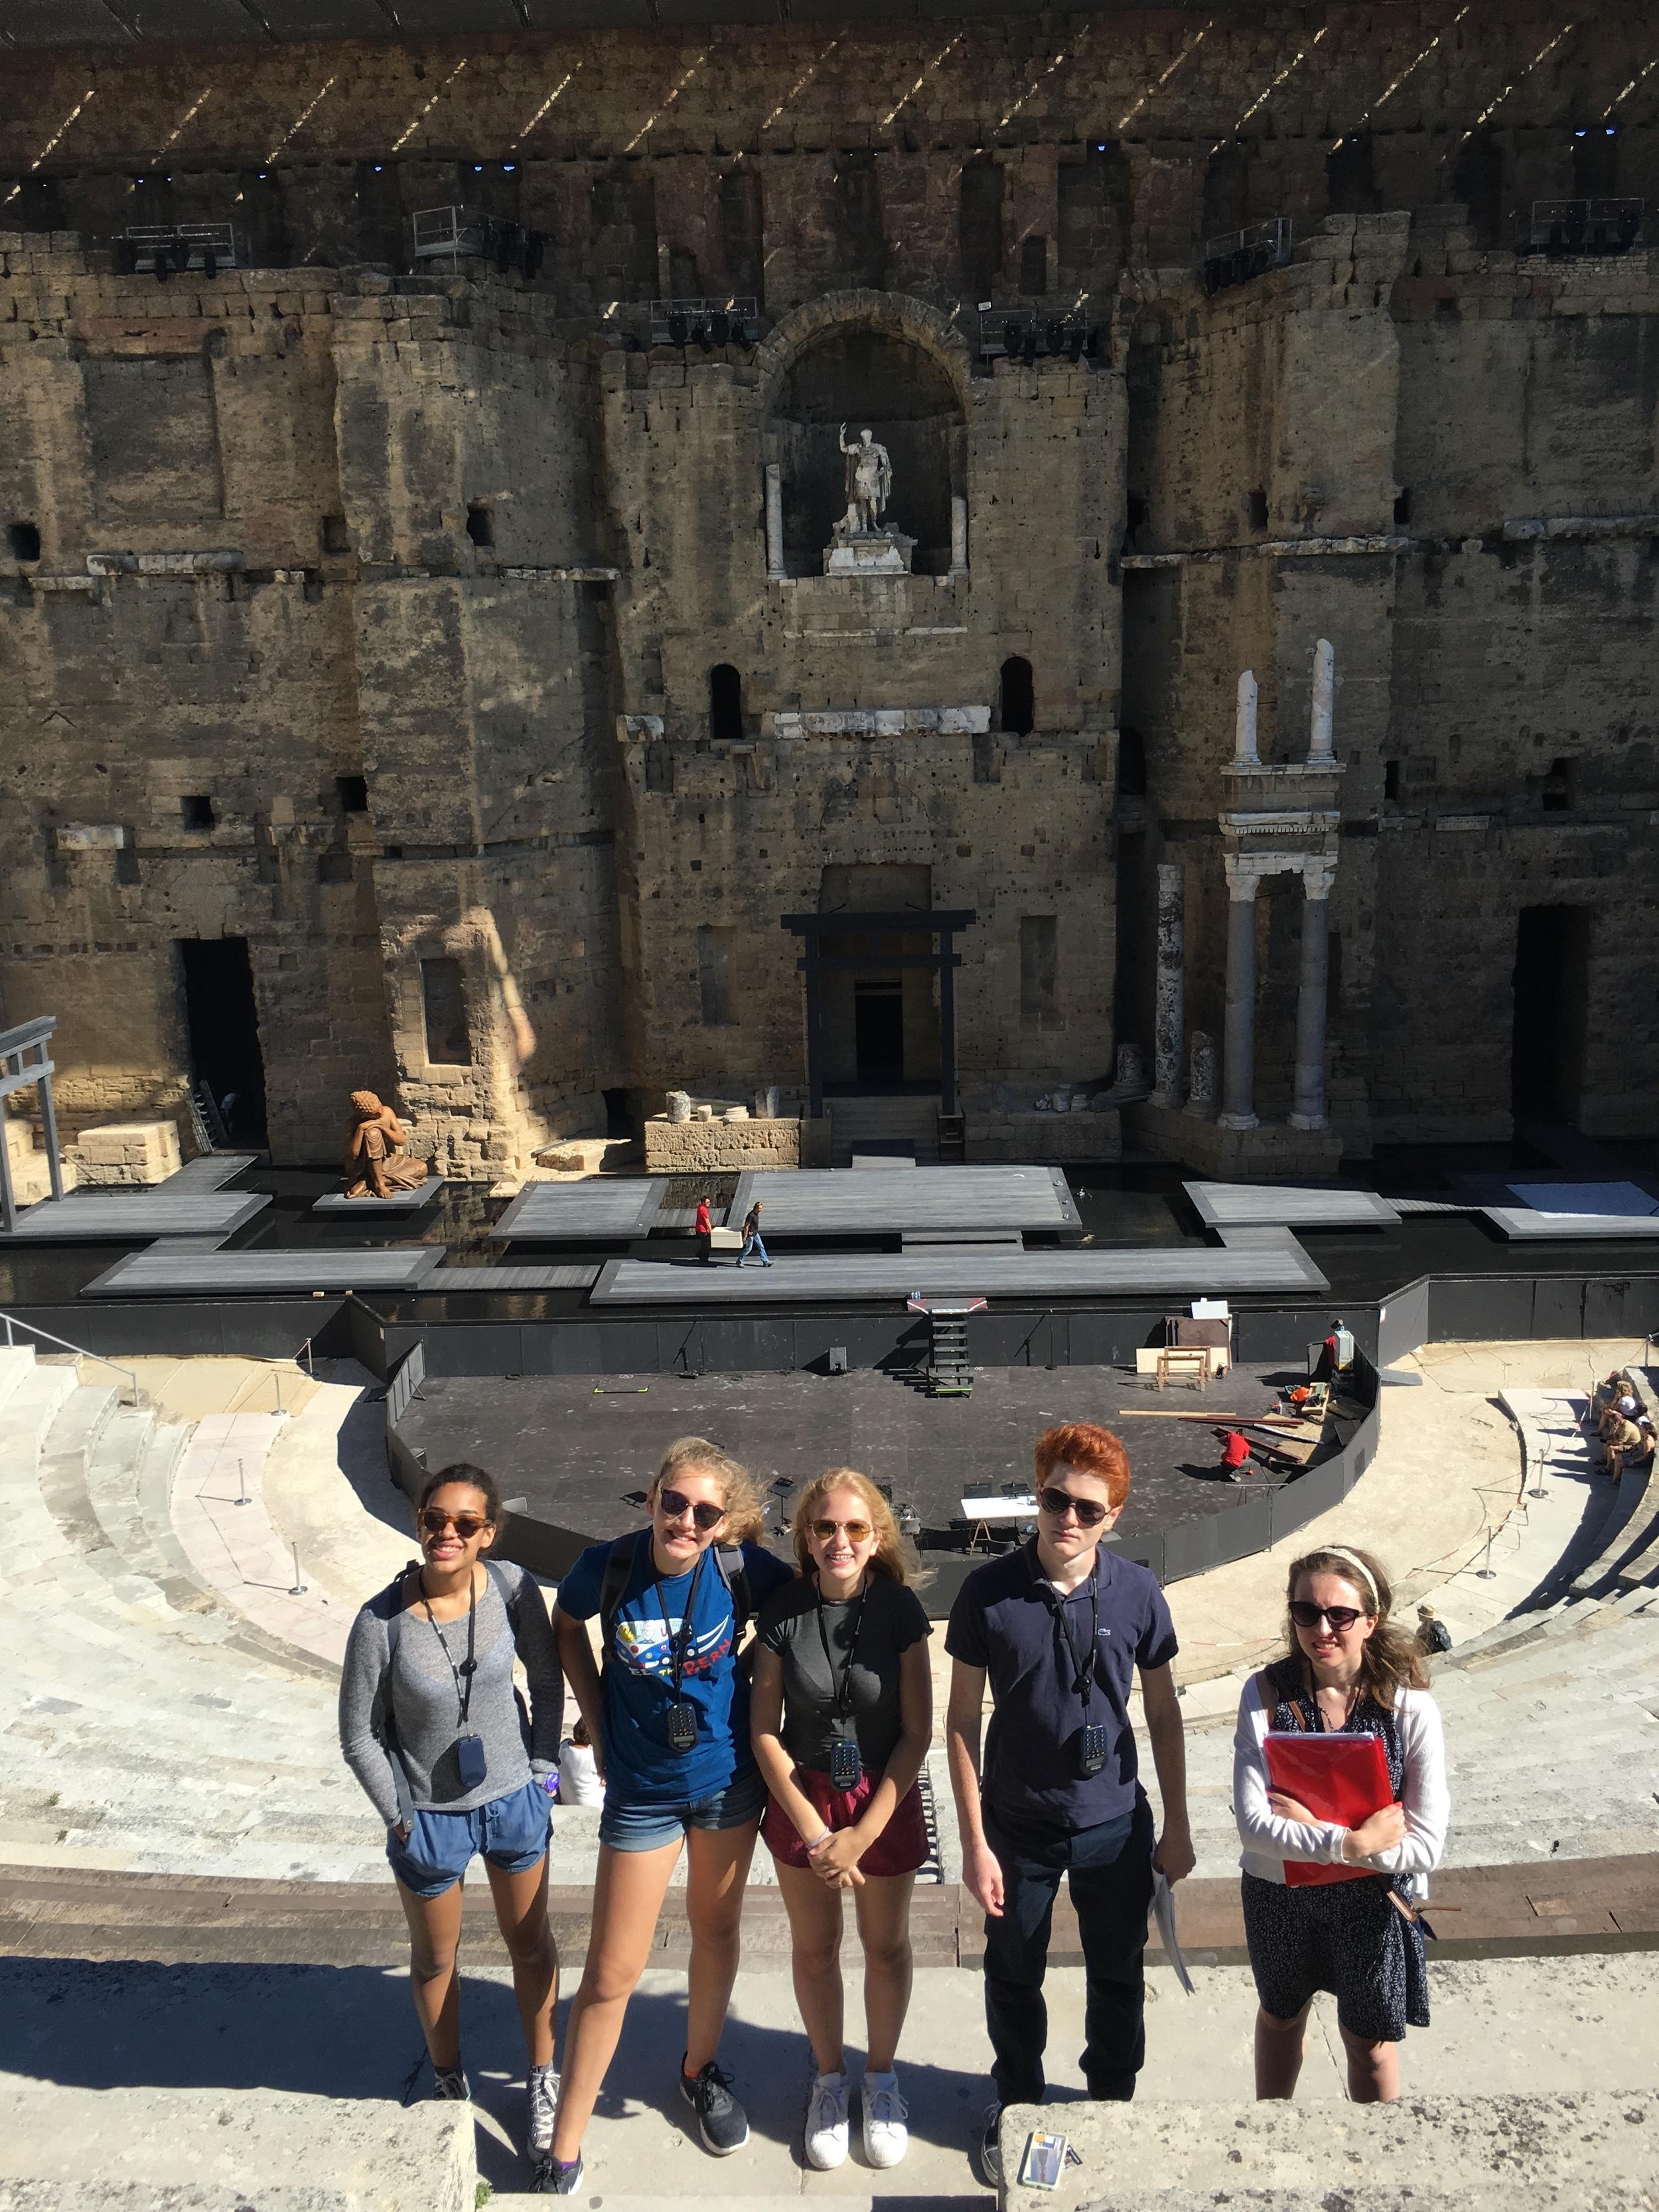 At the Roman theater in Orange.